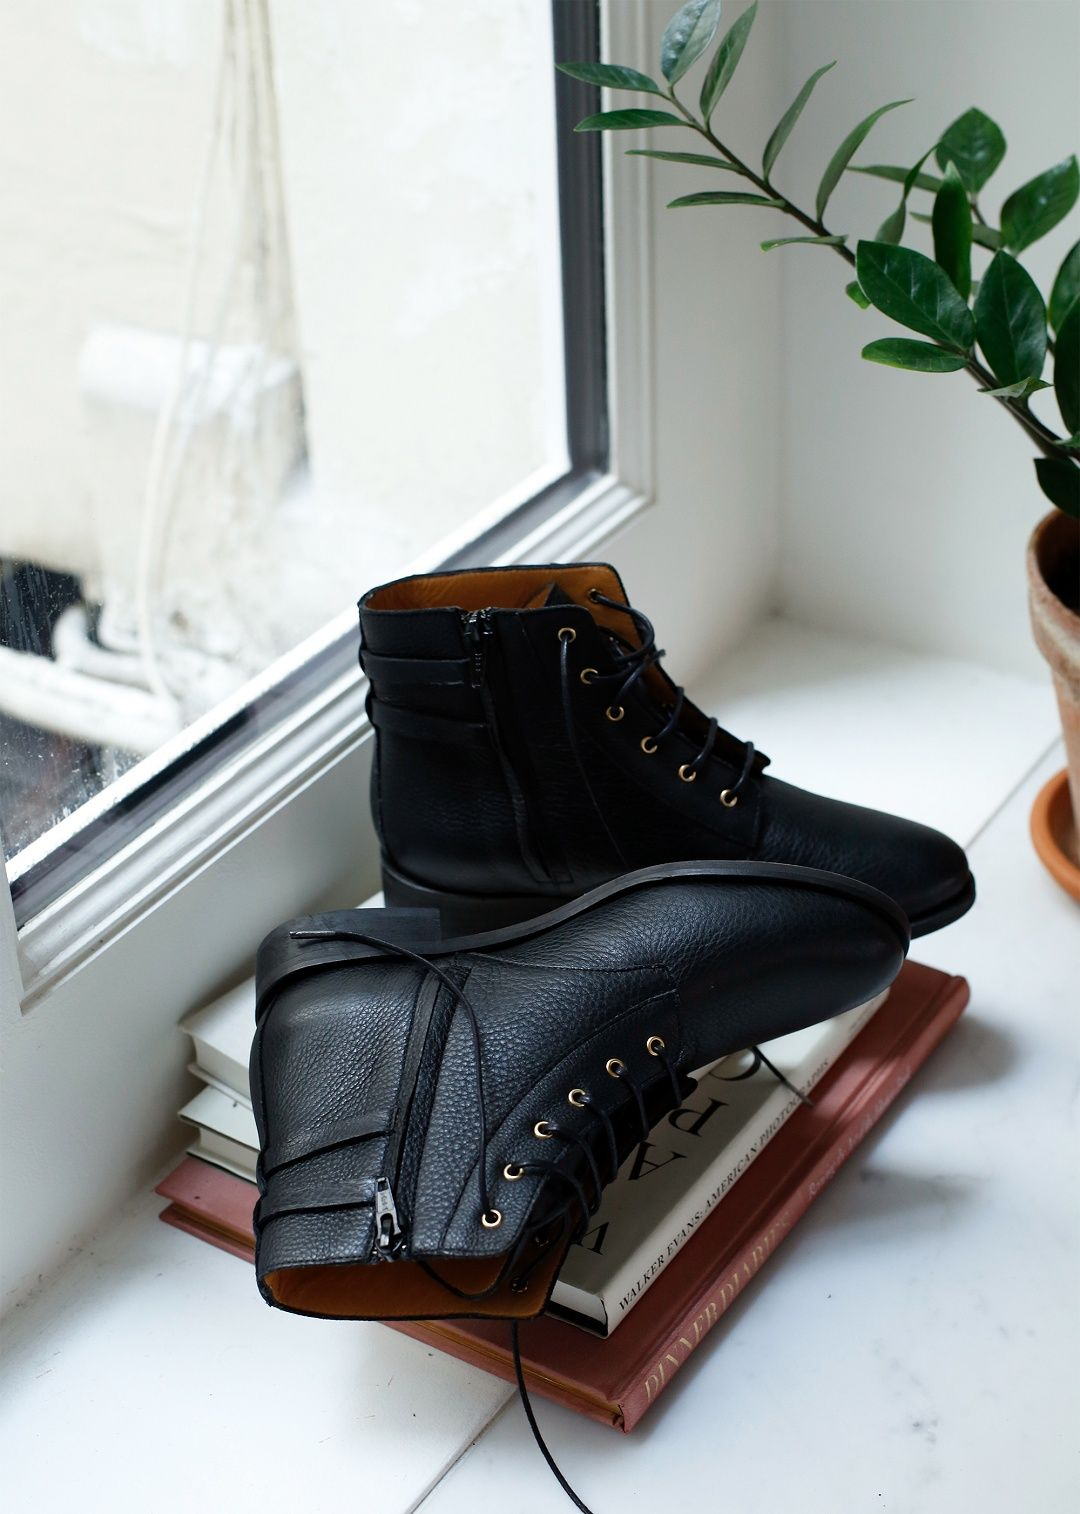 Sézane Low Solene Boots   Bottines, Sezane